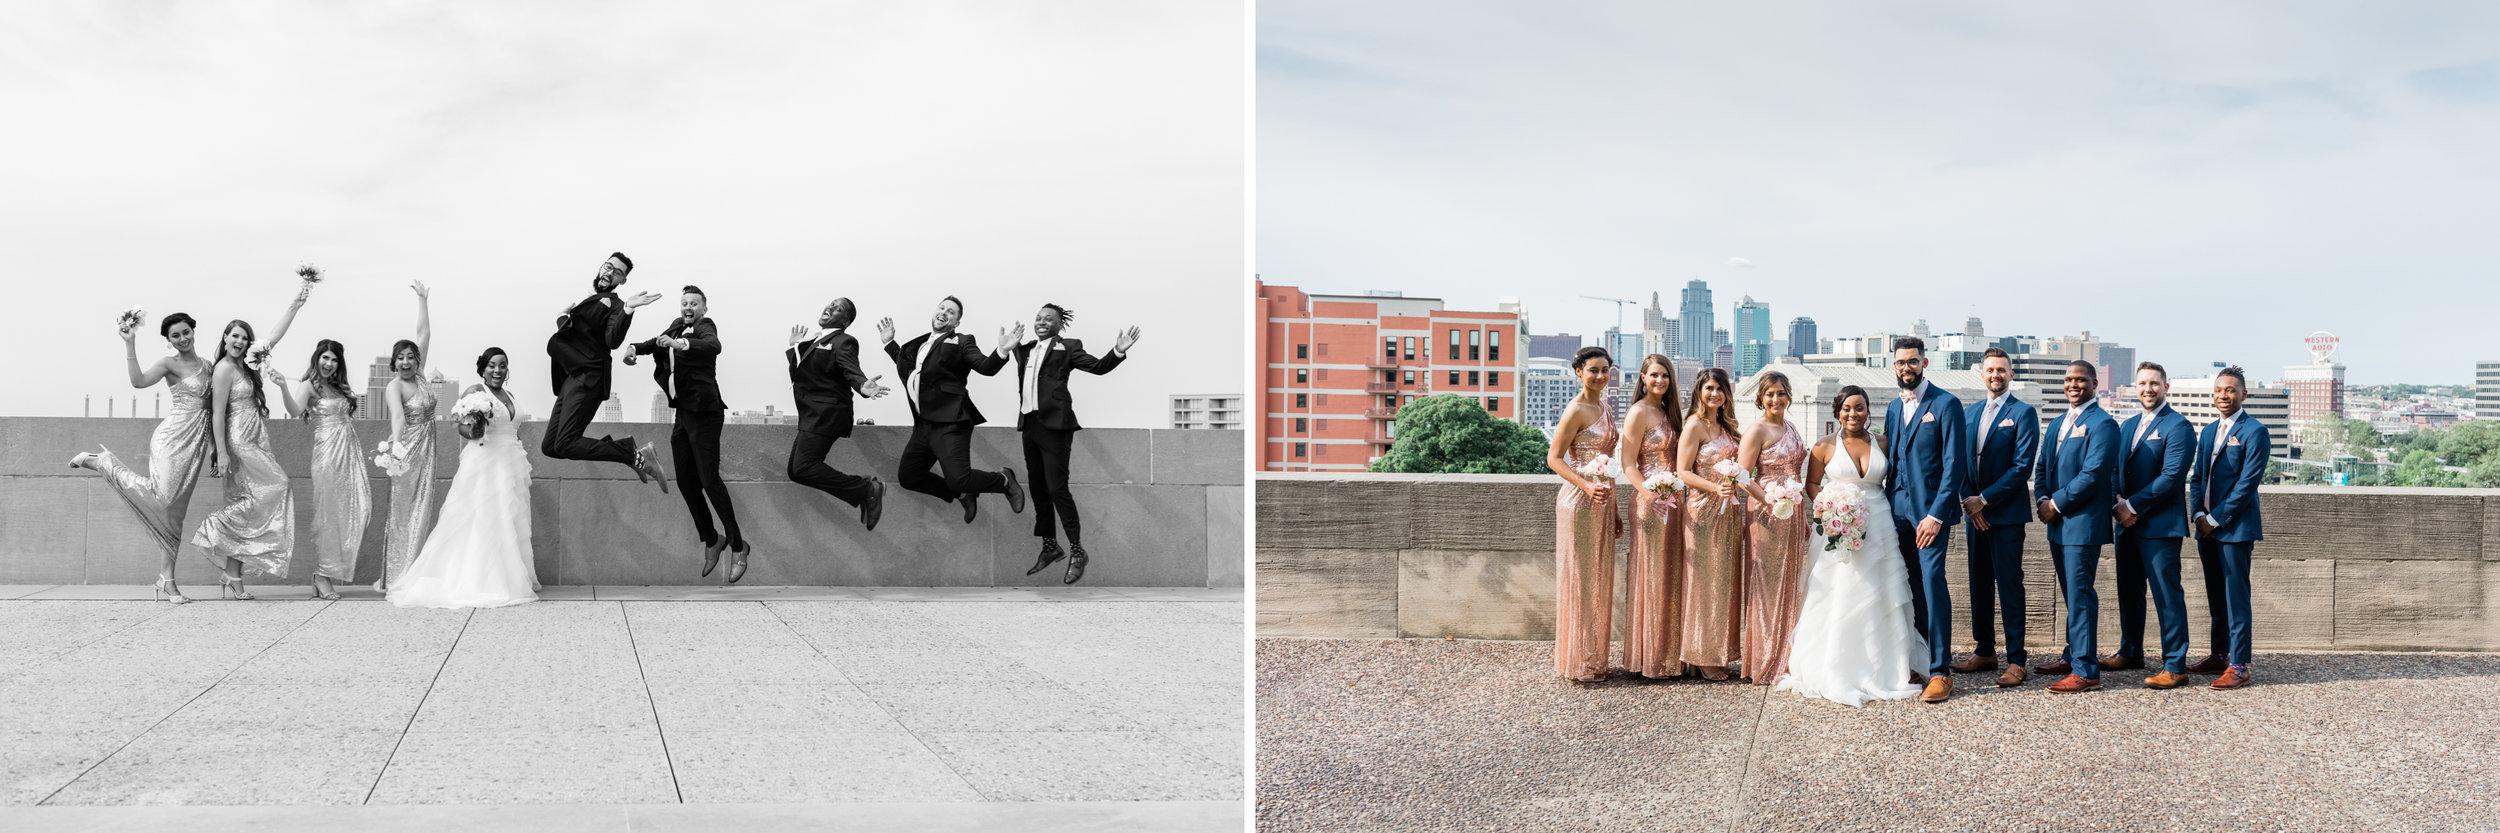 Kansas City Wedding Photographer 57.jpg